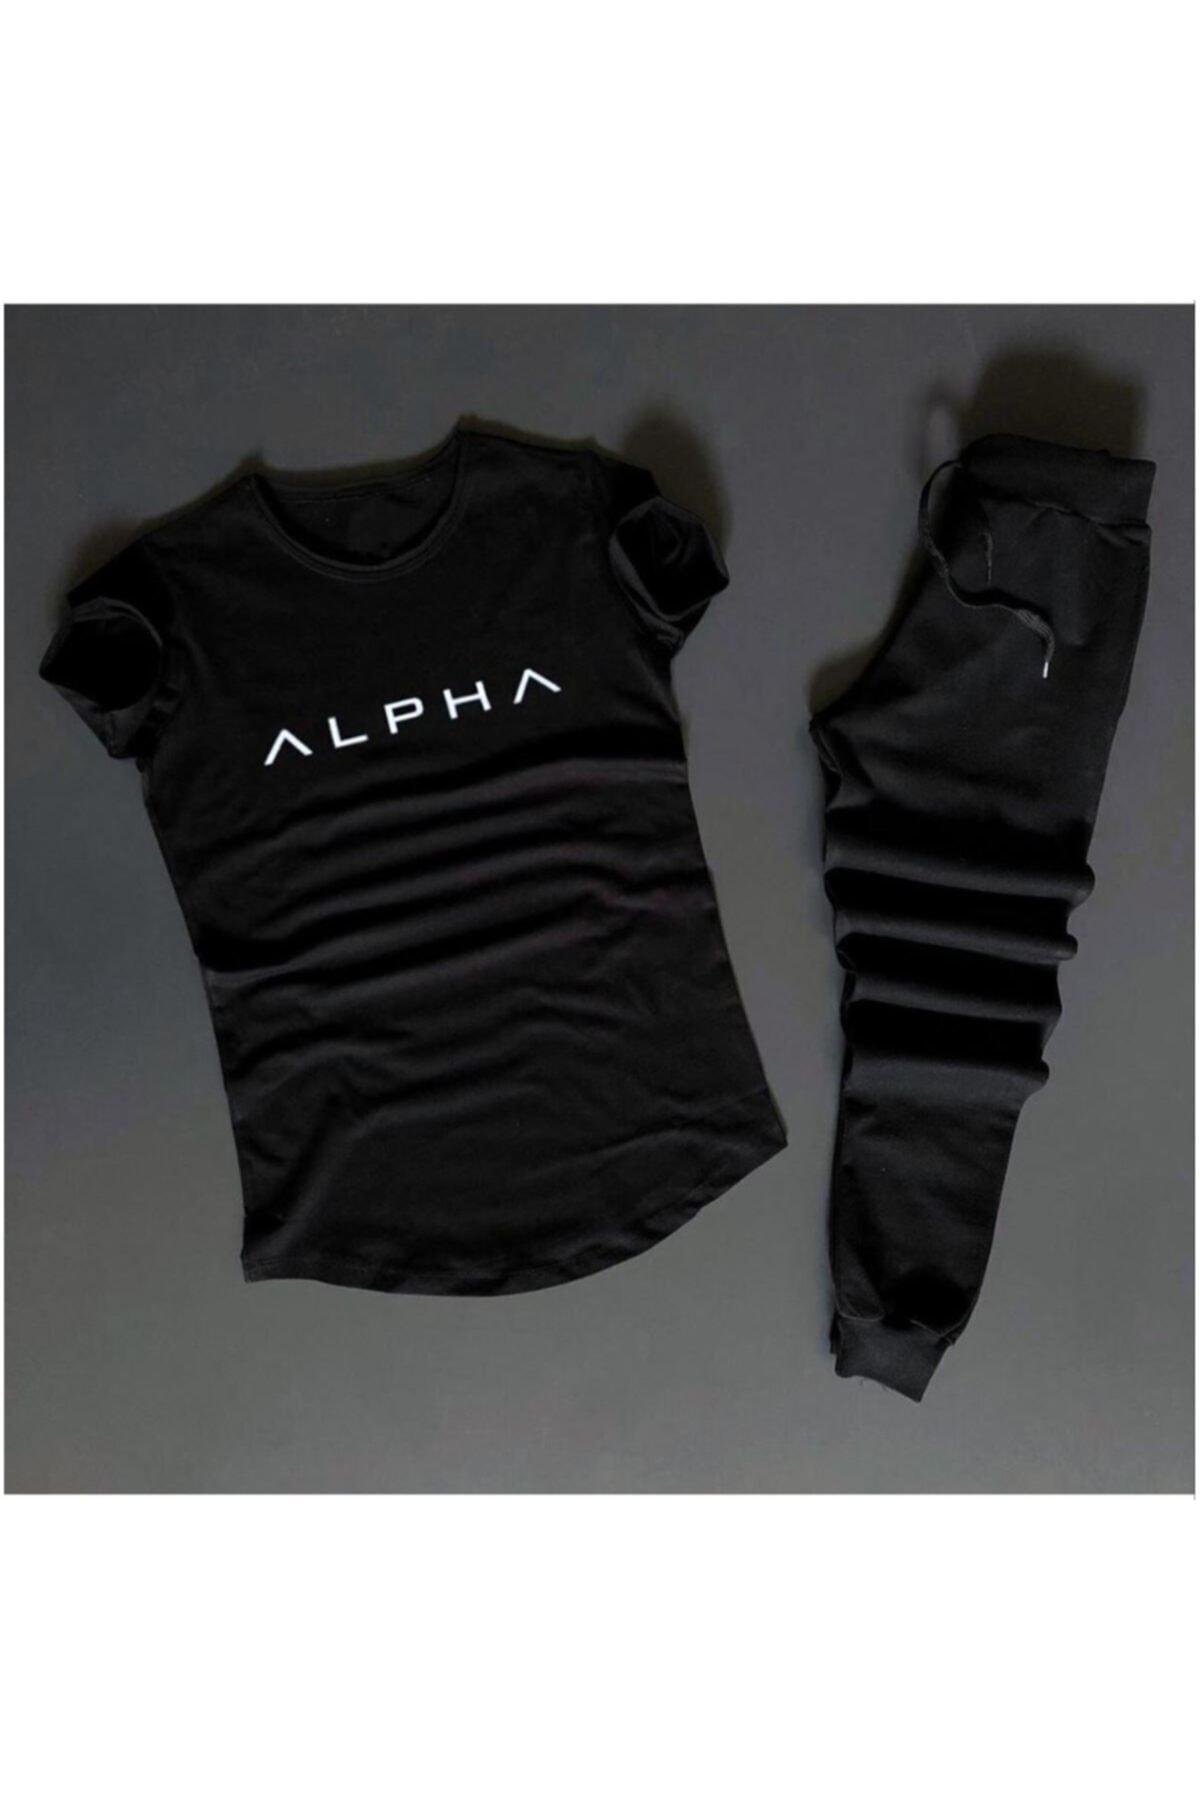 Alpha Siyah Eş Niksiyah Eşofman /d-4